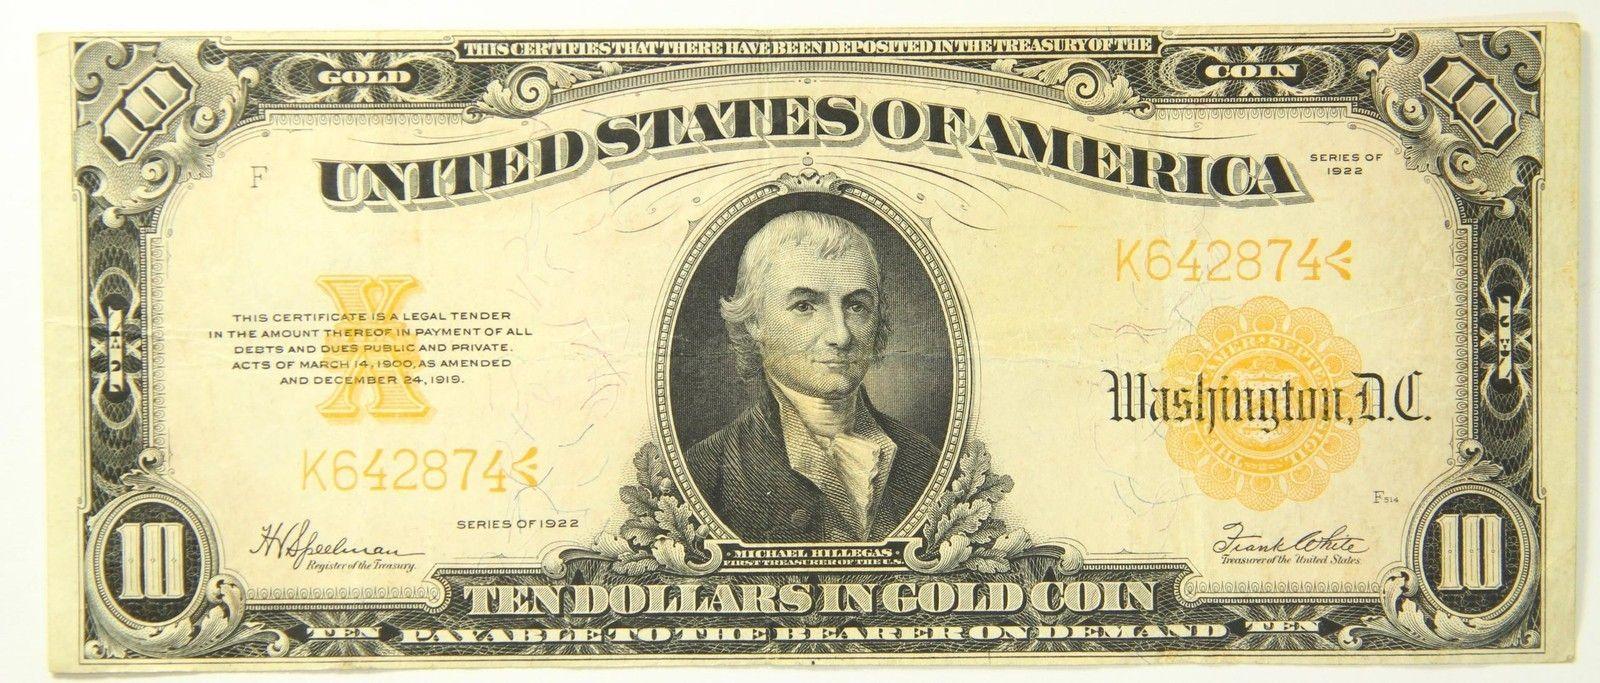 1922 Ten Dollar 10 Bill Gold Certificate Large Note F 1173 Gold Seal